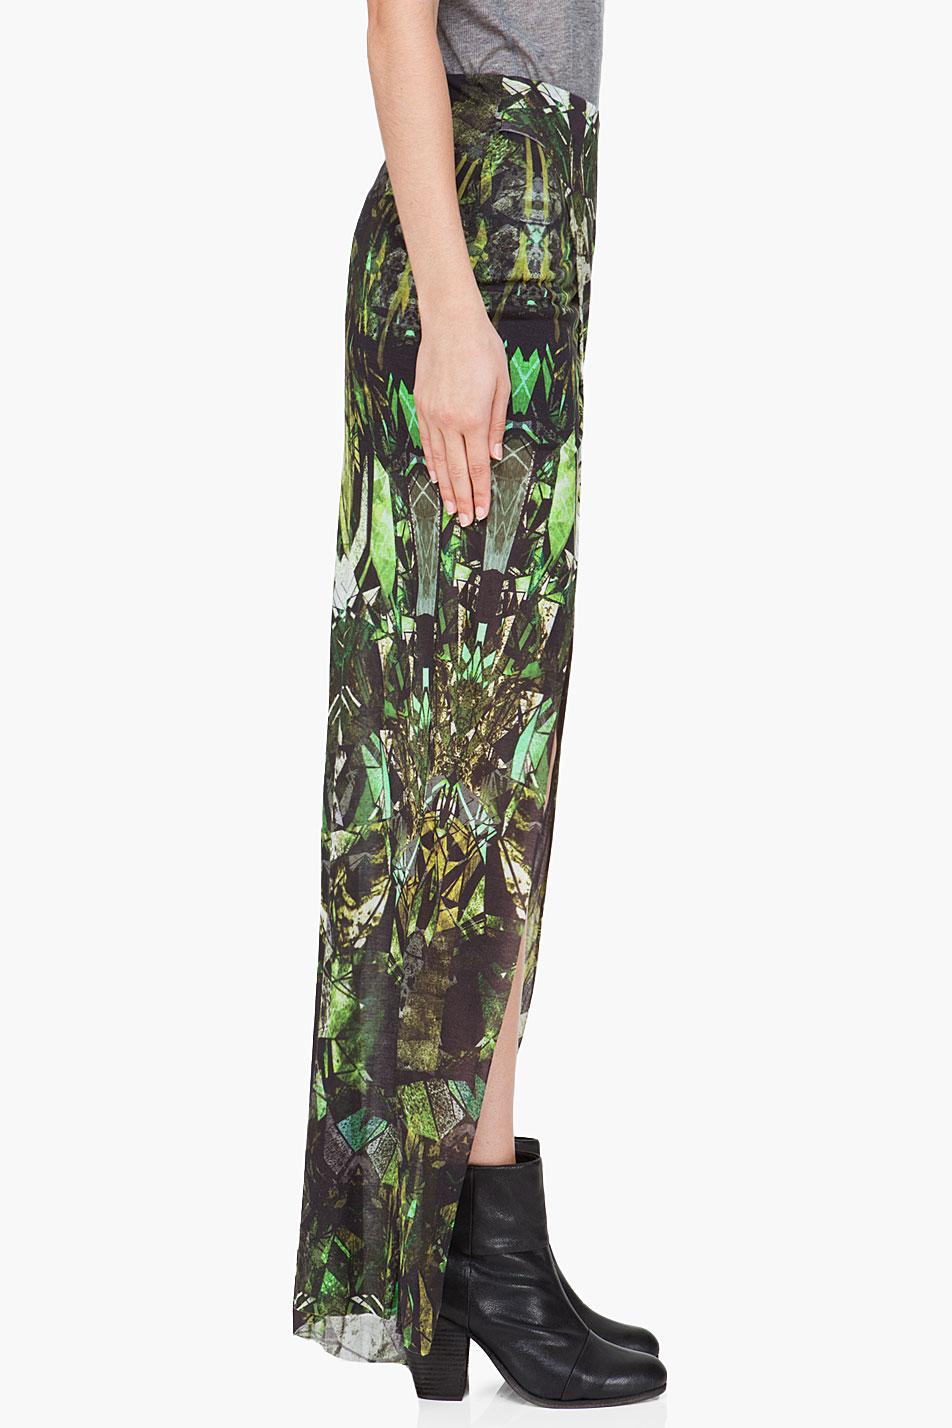 helmut lang spiderweb print split jersey maxi skirt in